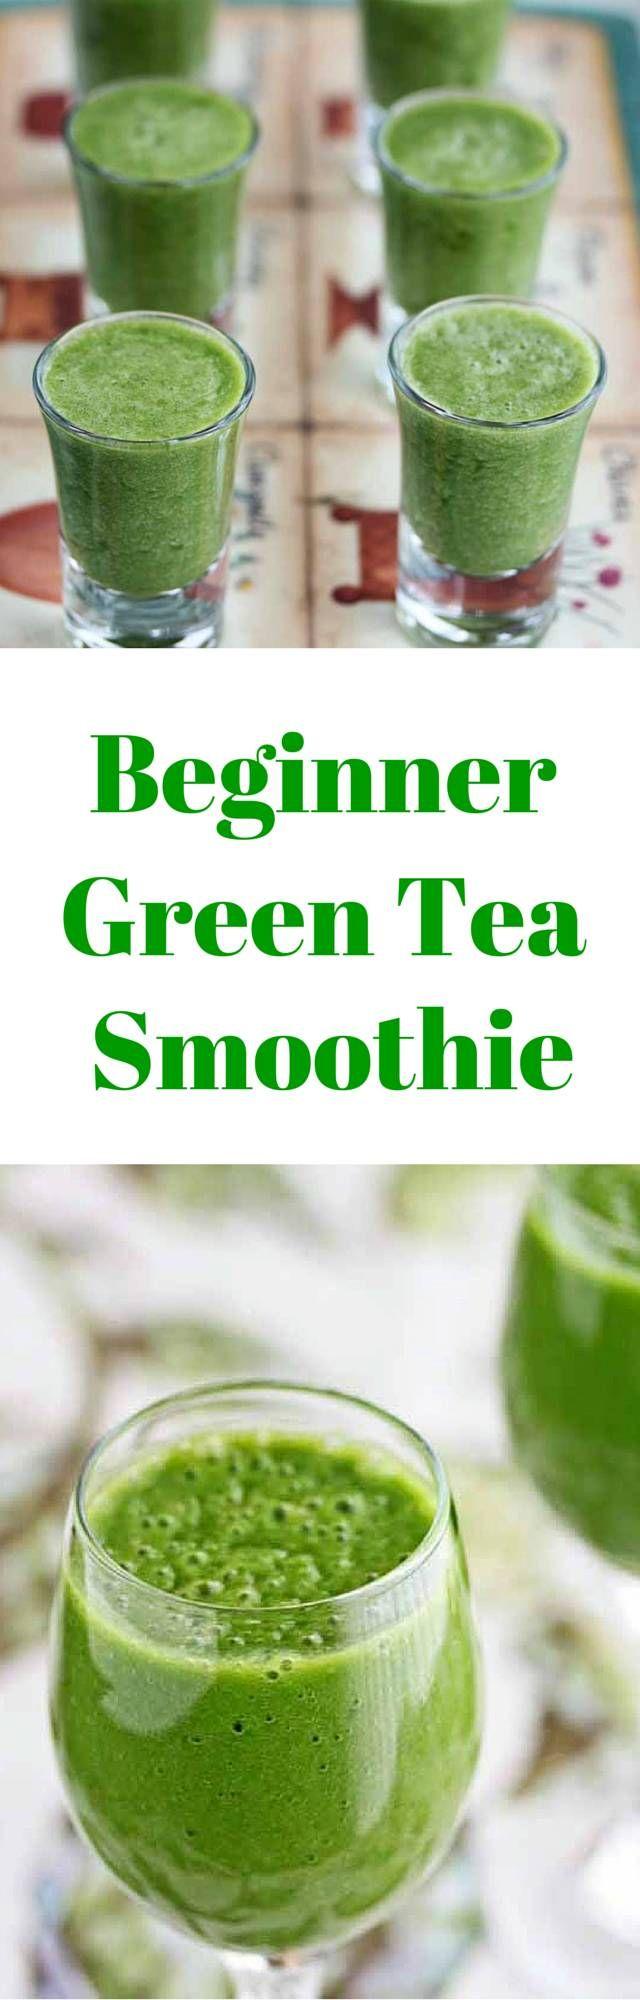 Beginner Green Tea Green Smoothie | Recipe | Green tea ...